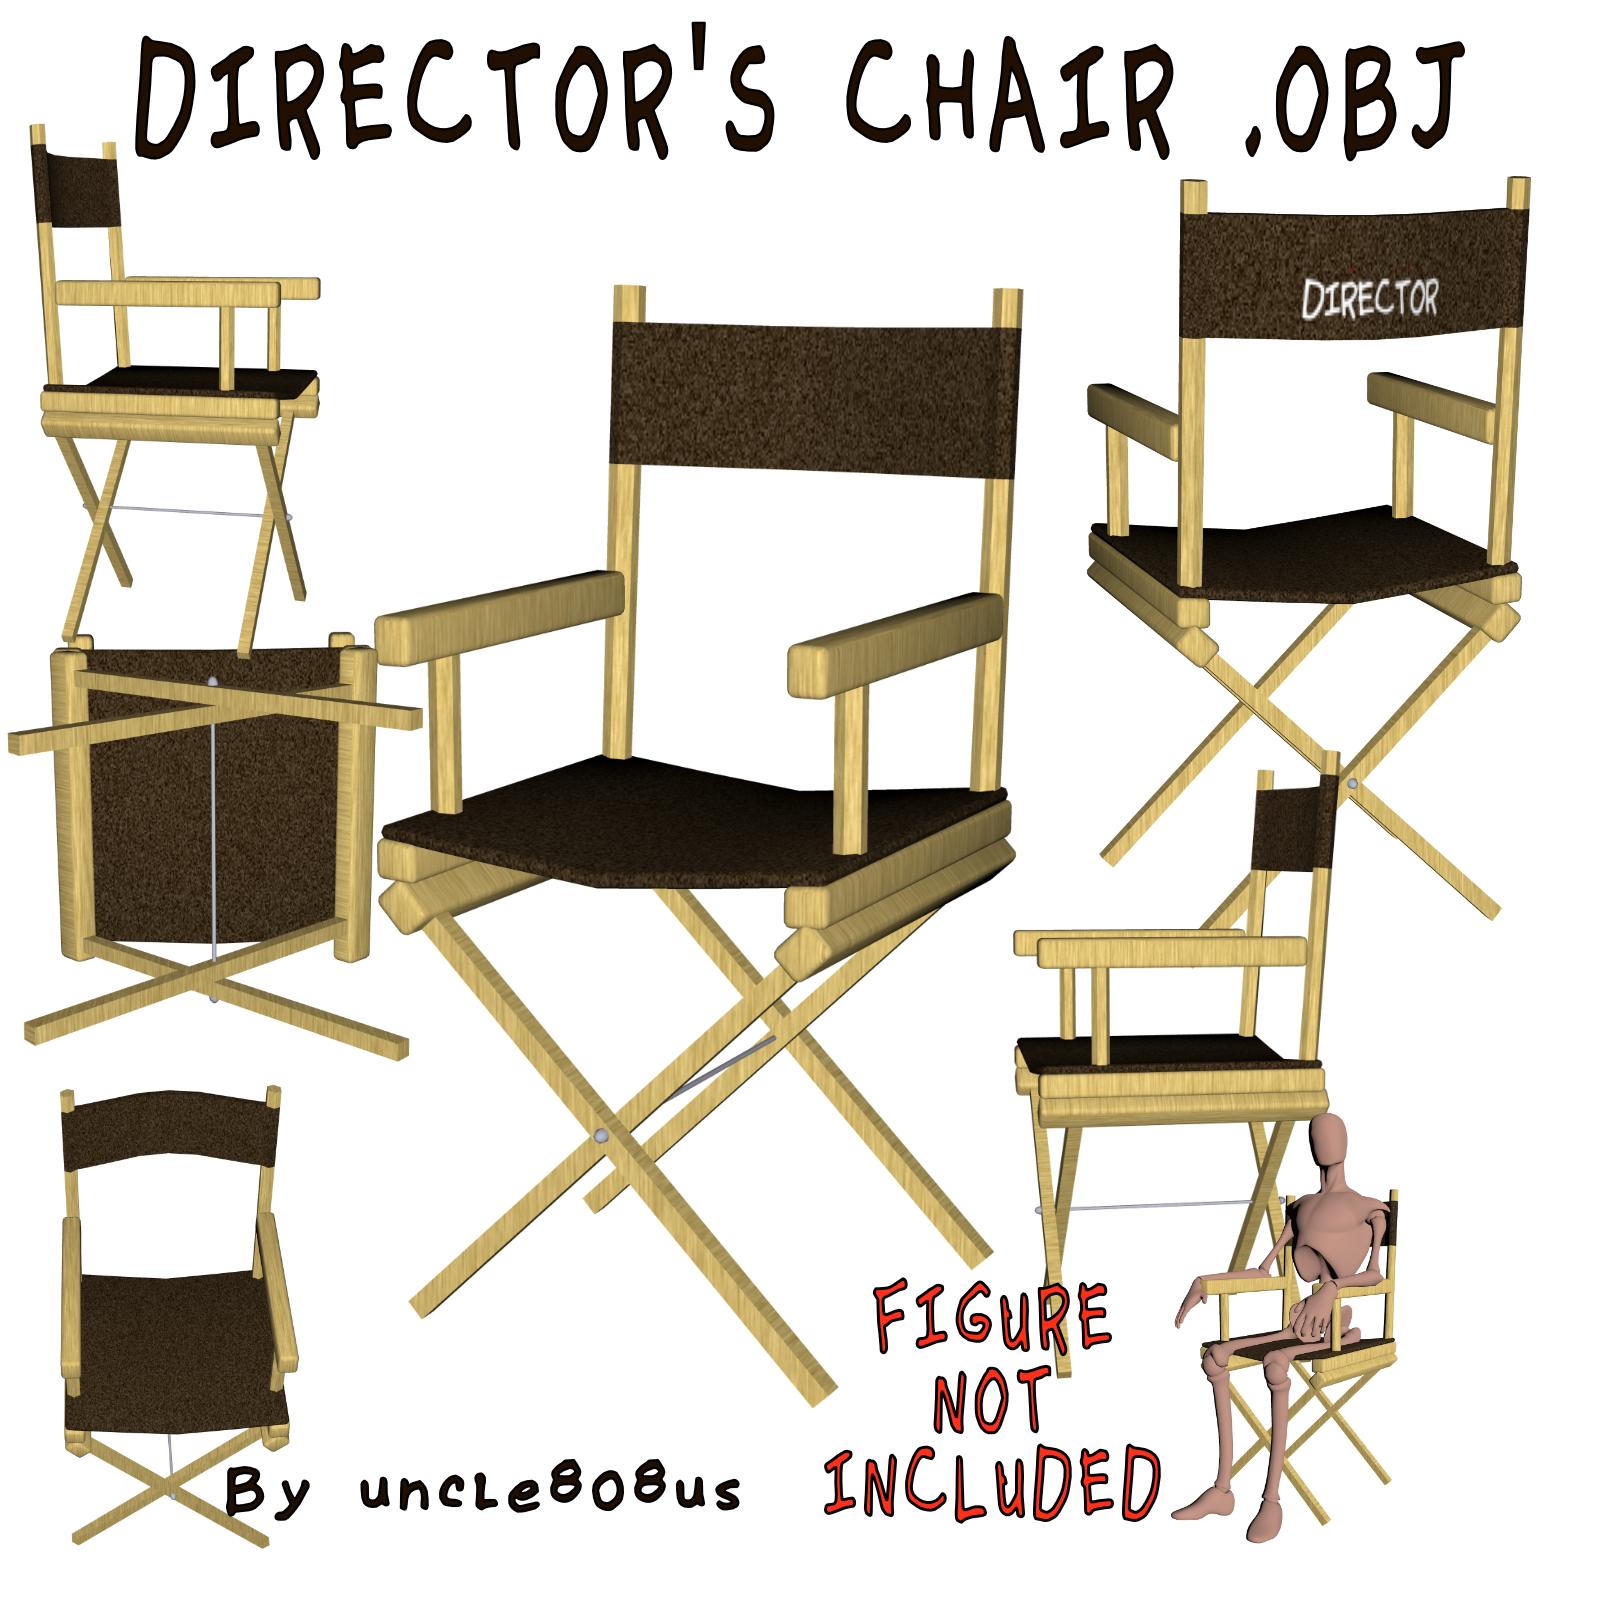 režisora krēsls 3d objekts 3d modelis cits obj 274163